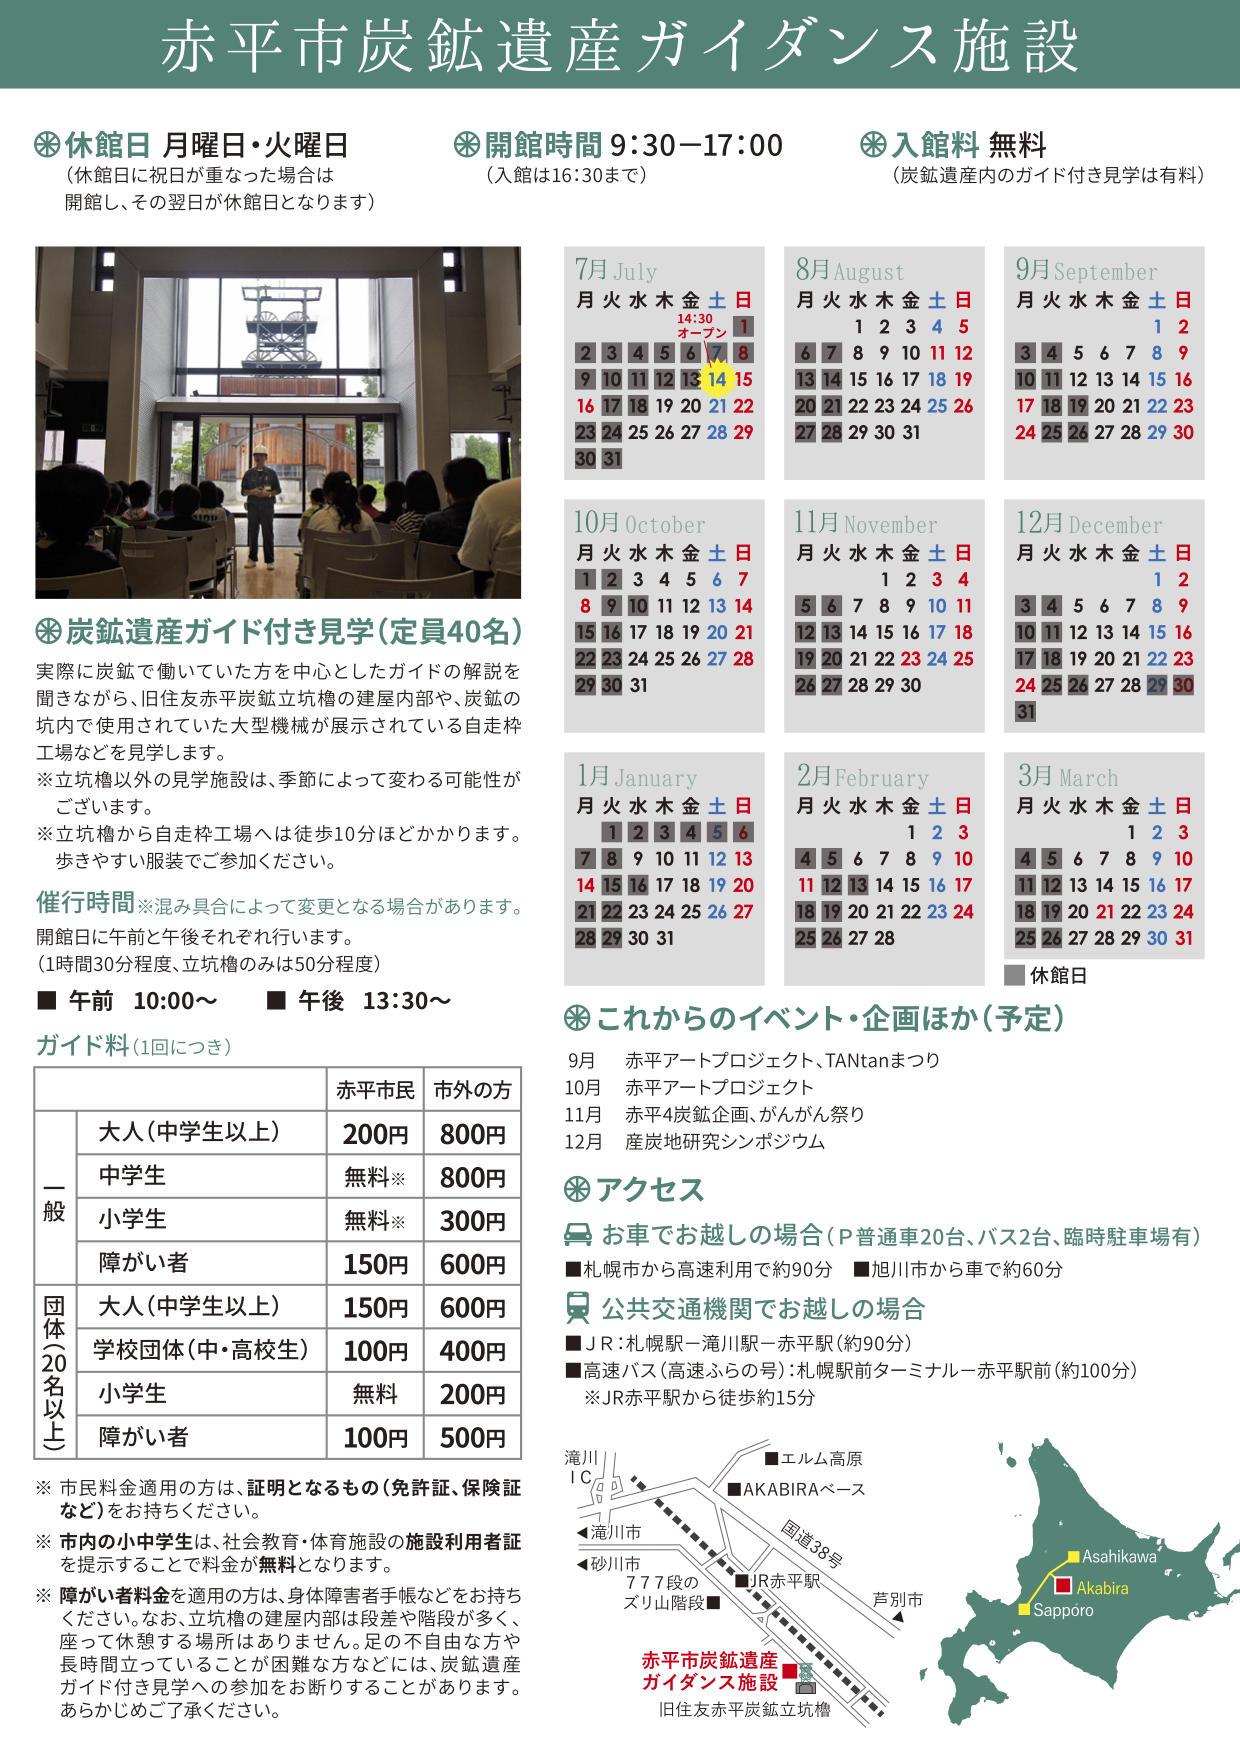 https://kurashigoto.hokkaido.jp/image/2b7736f77978b09a430bb2720a62d7de0f5b6721.jpg